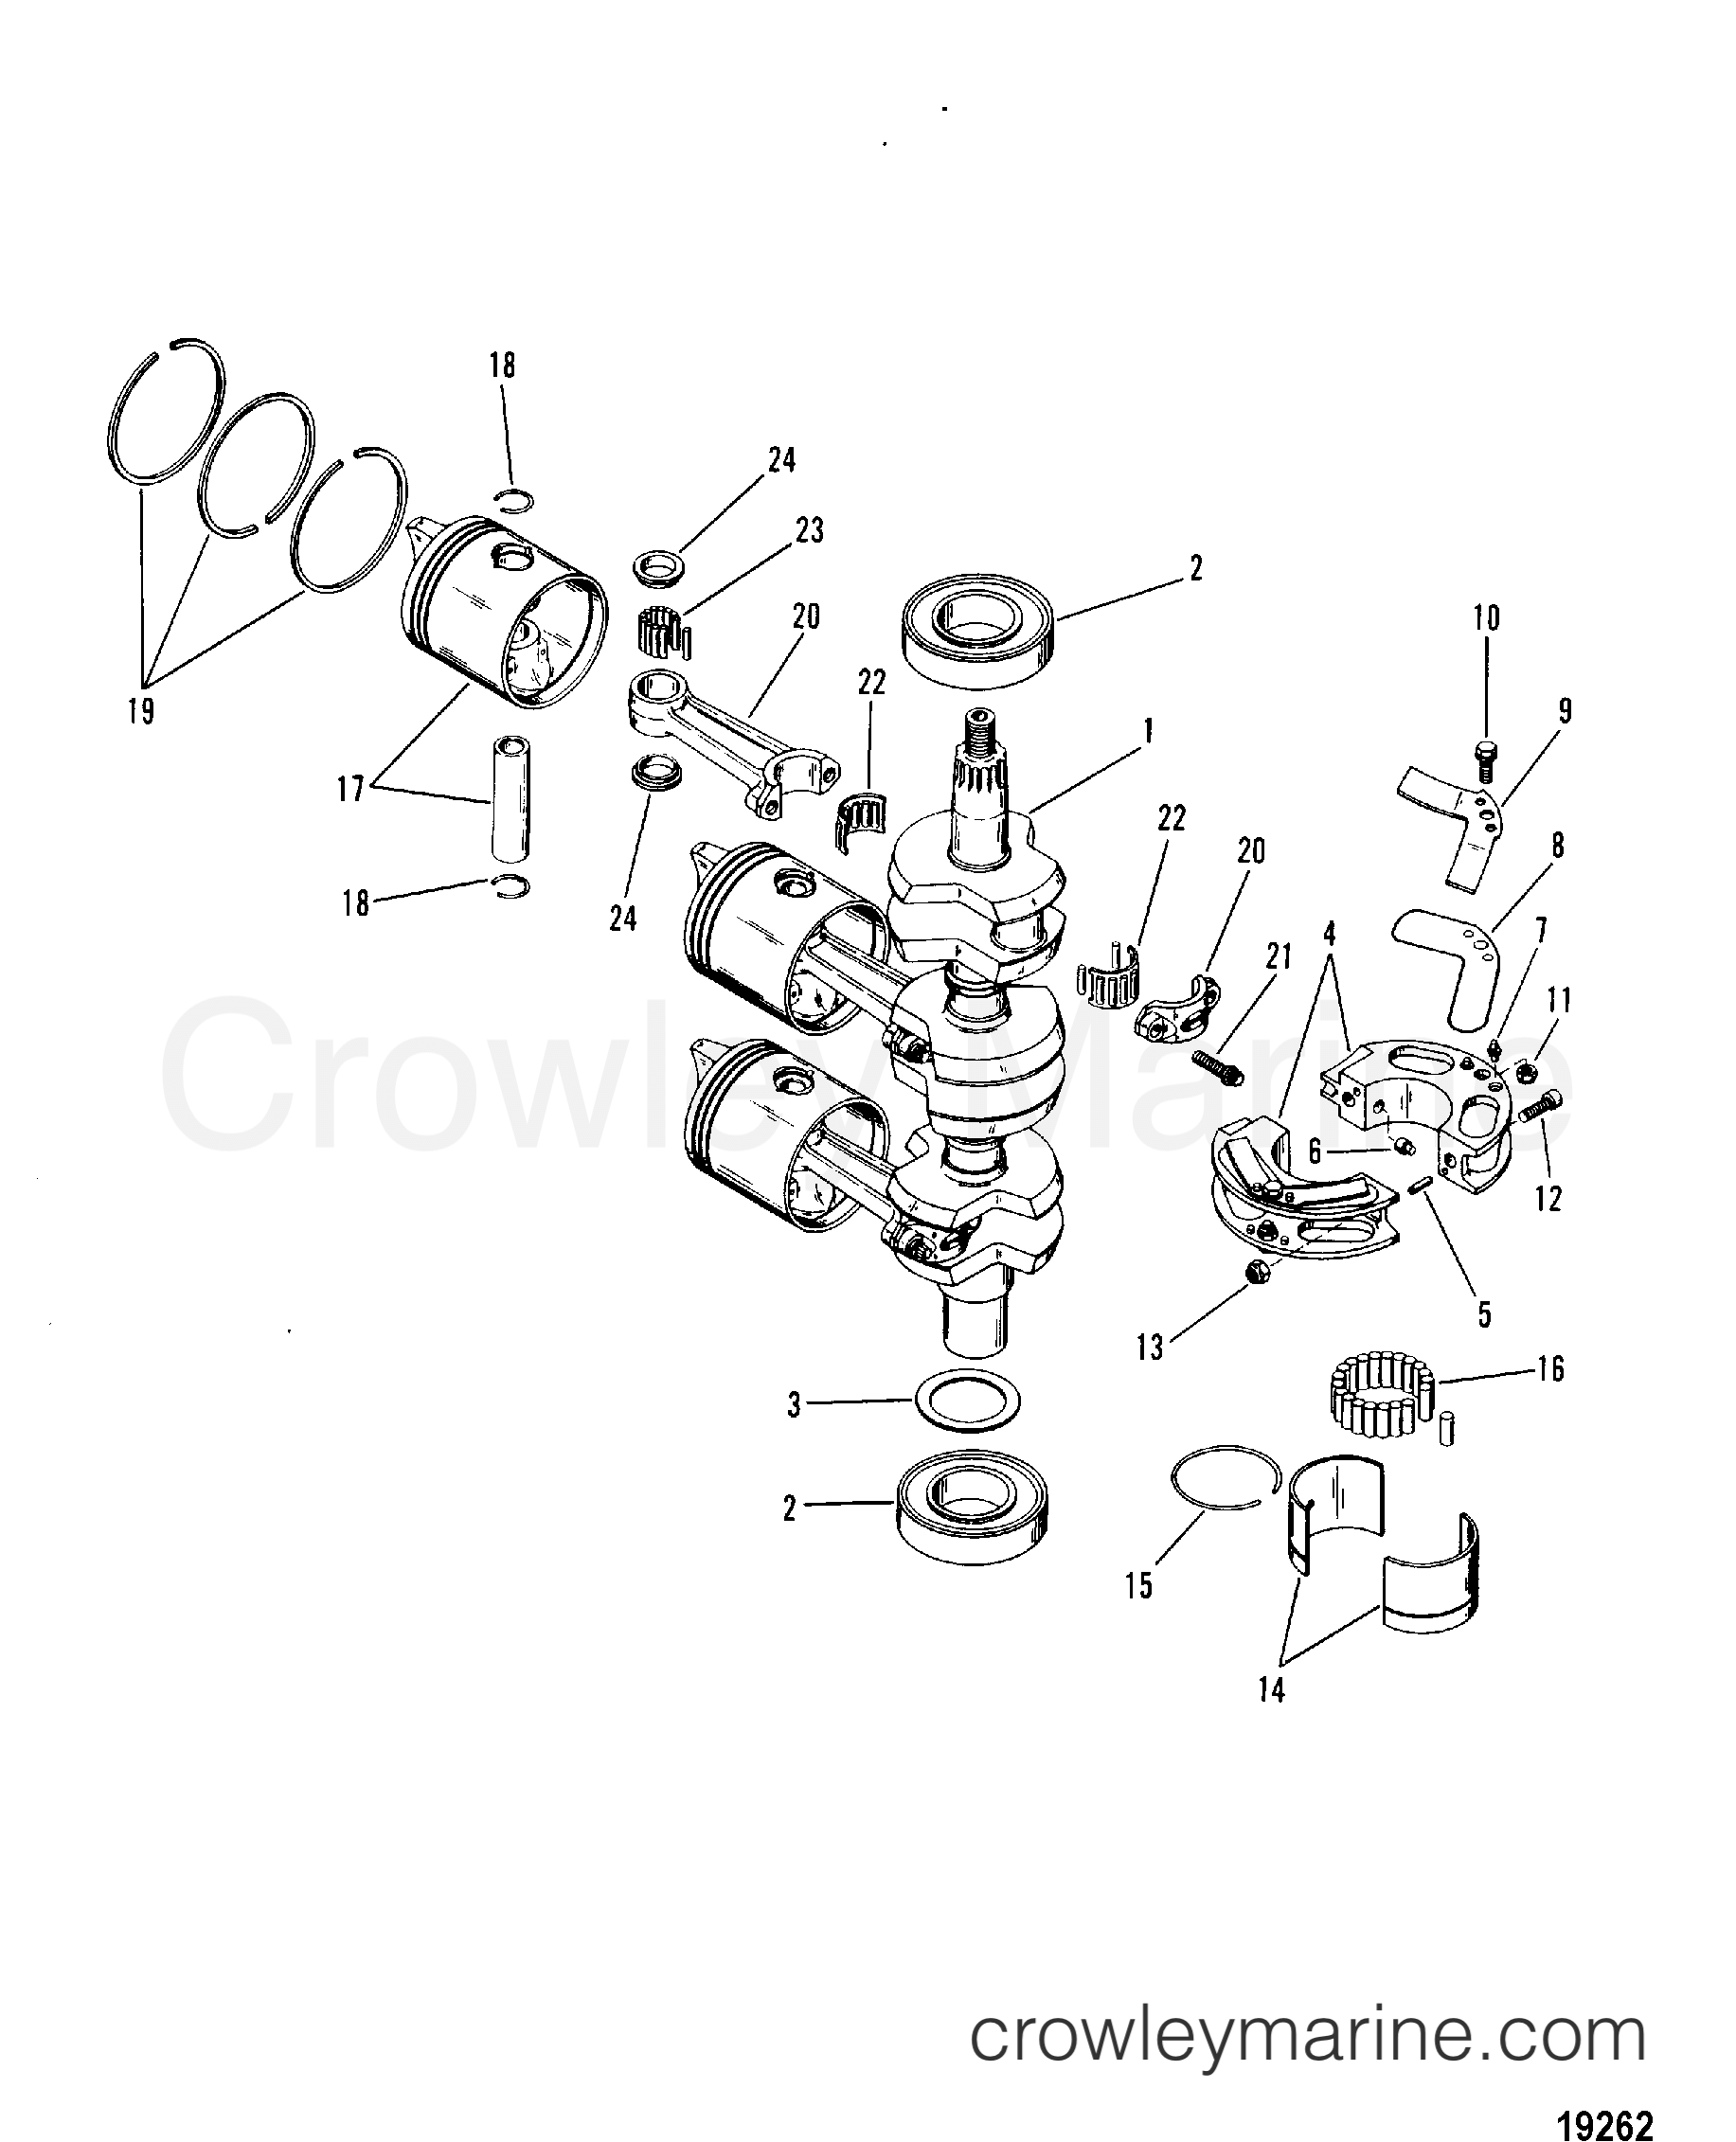 1989 Hors-bord Mariner 60 [ELPTO] - 7060412PC - VILEBREQUIN, PISTONS ET BIELLE section